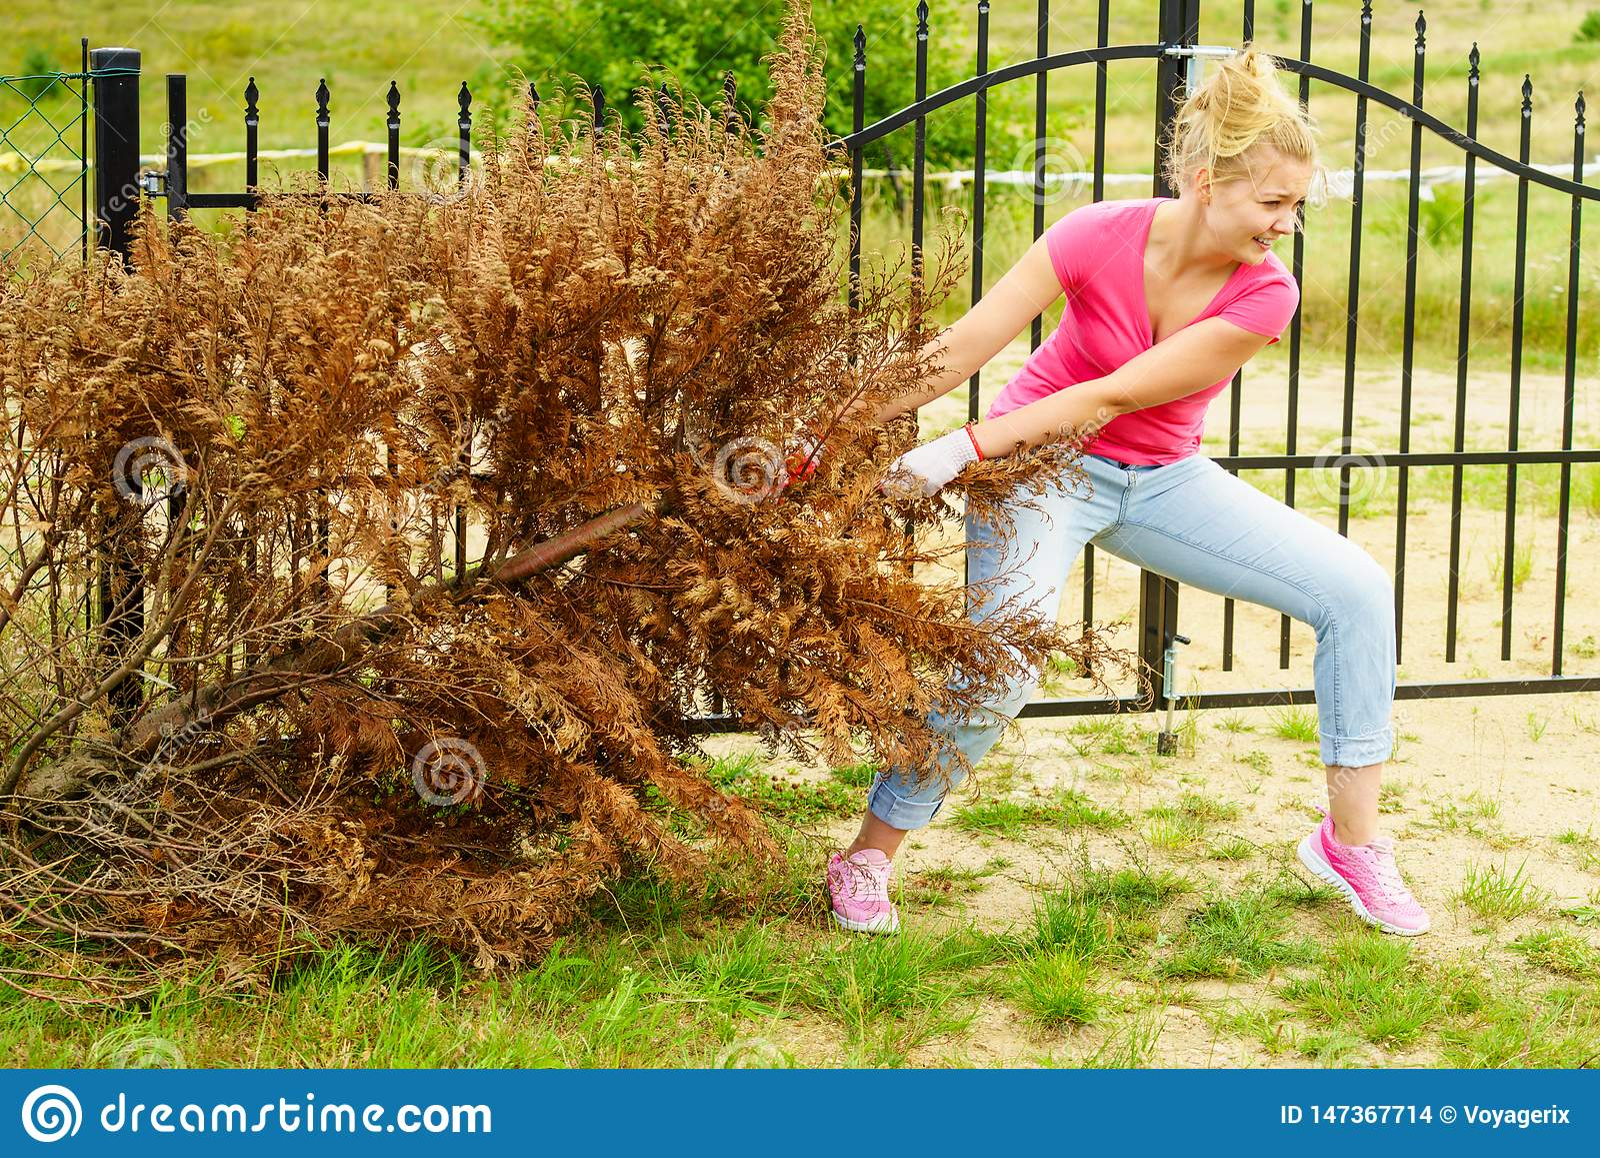 Woman Removing Dried Thuja Tree From Backyard Stock Photo ...